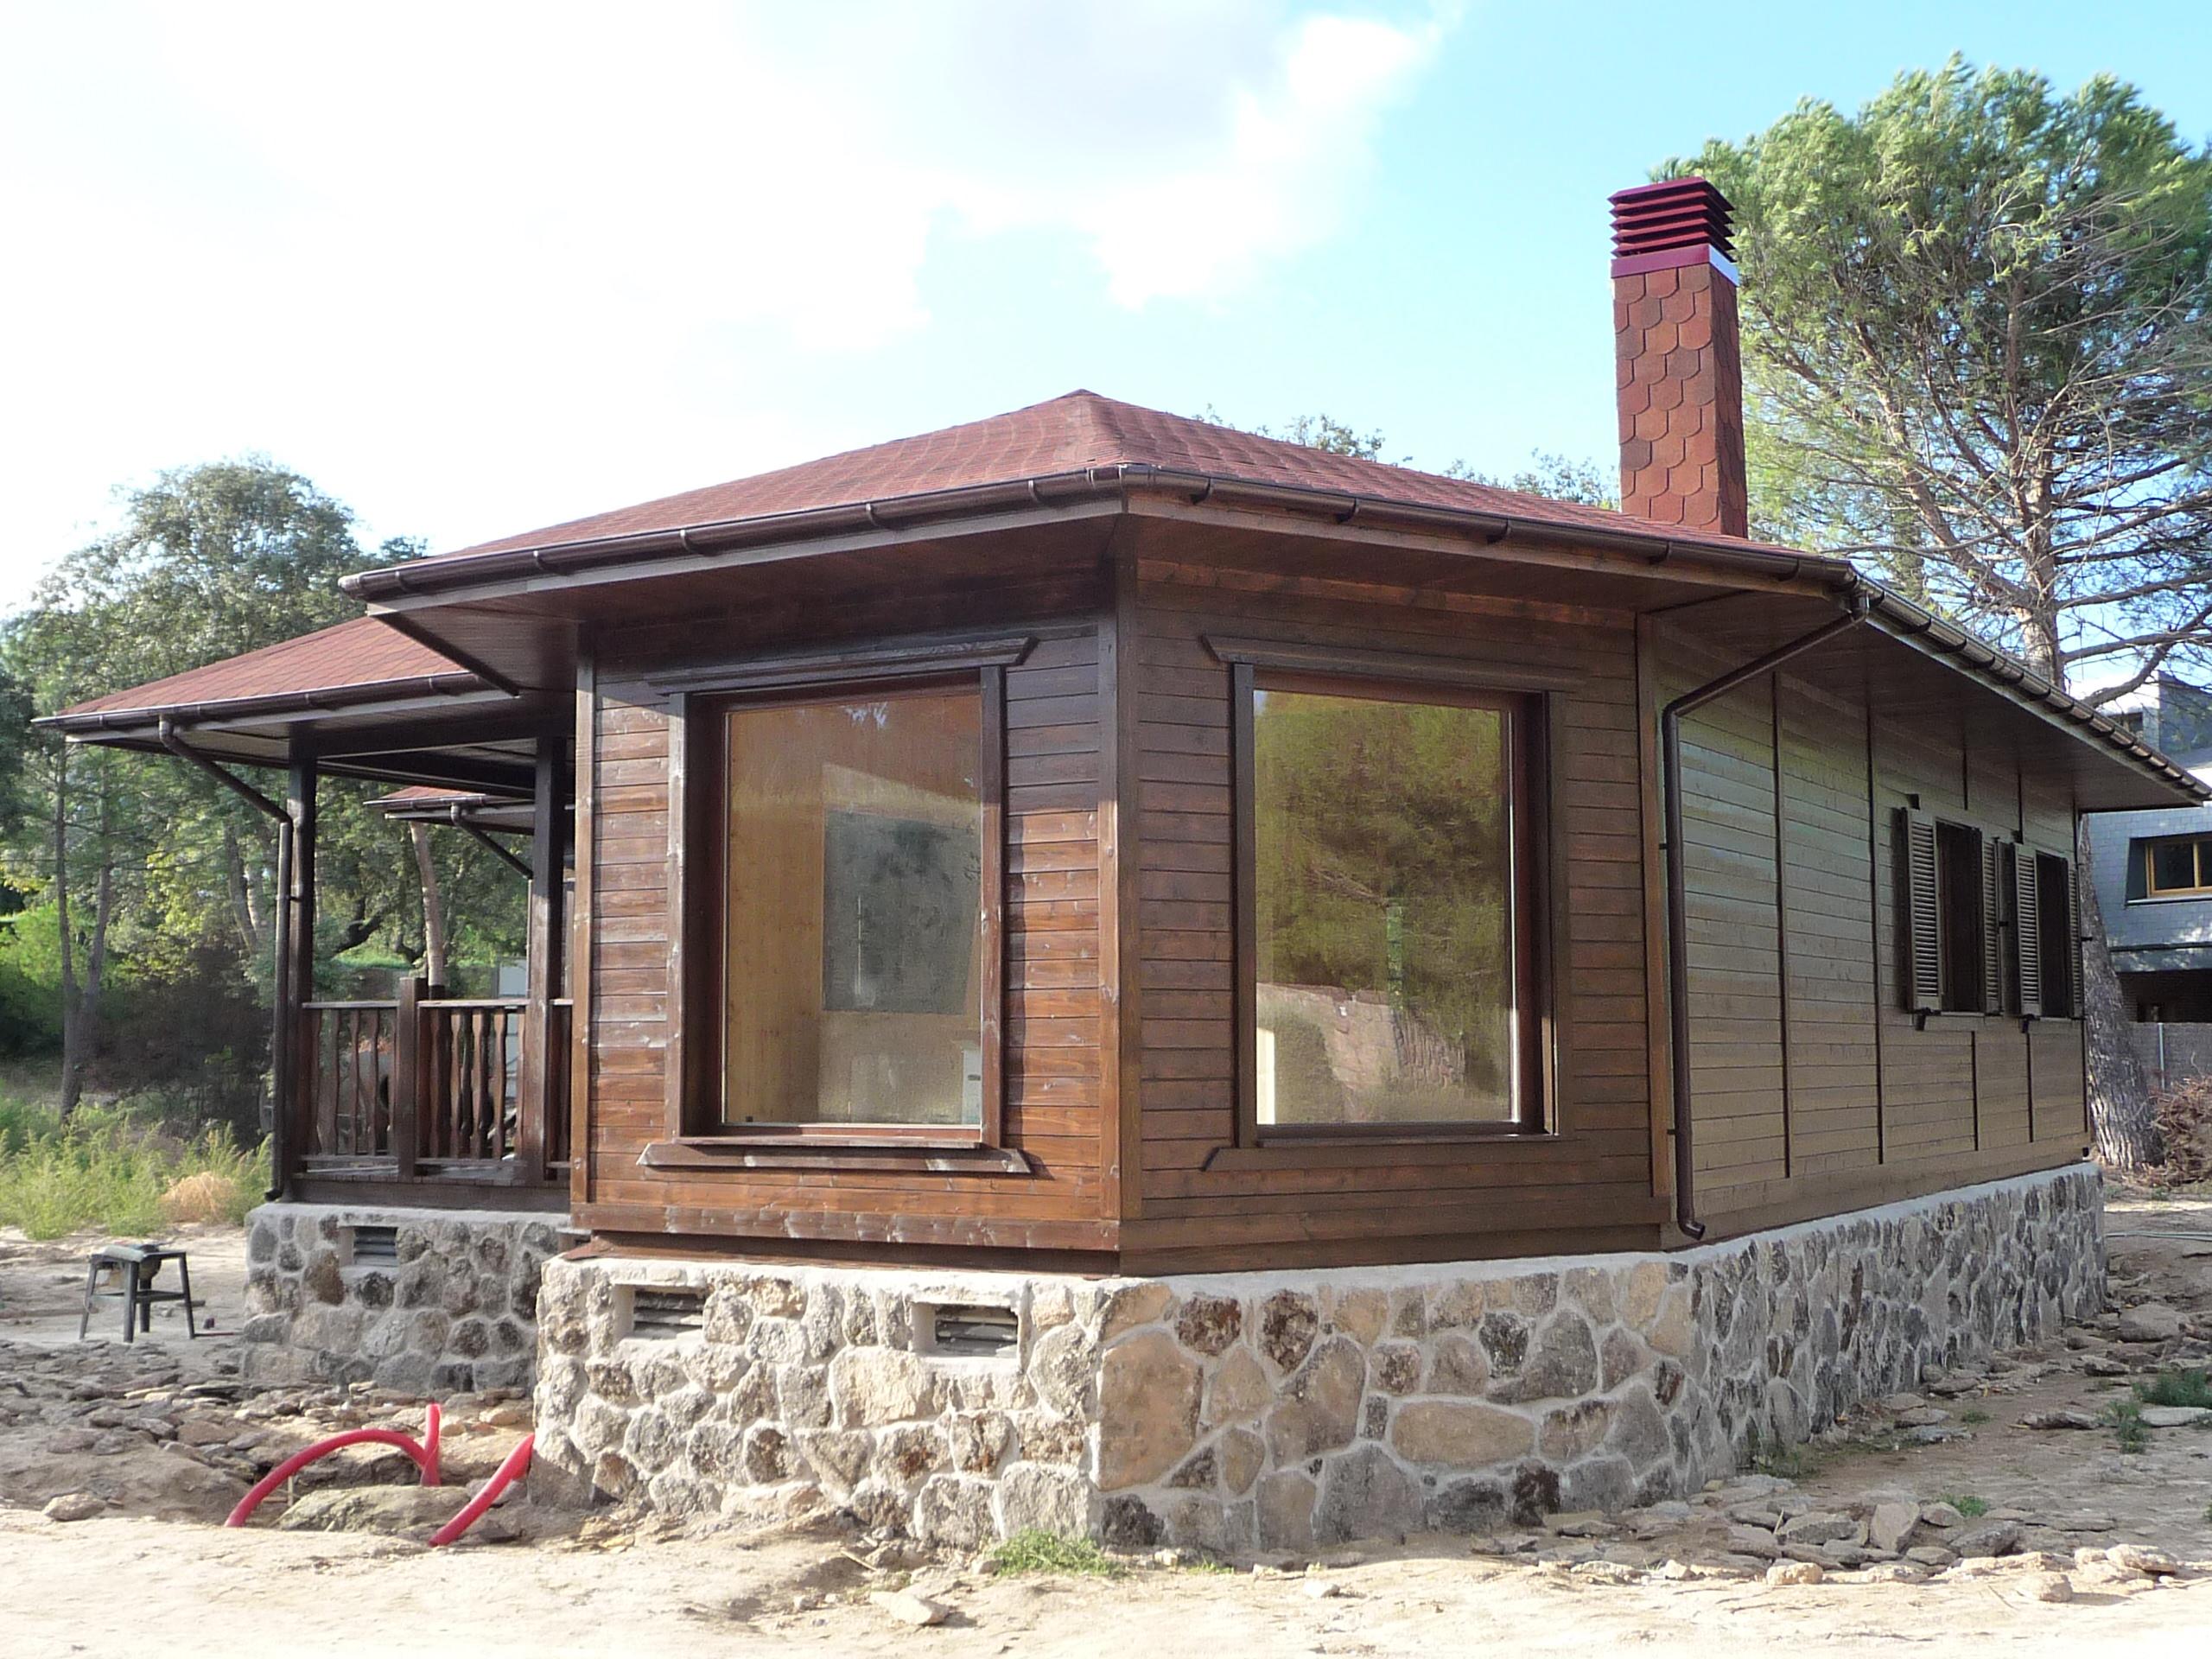 Casa de madera comprar casas de madera - Casa de madera precios ...